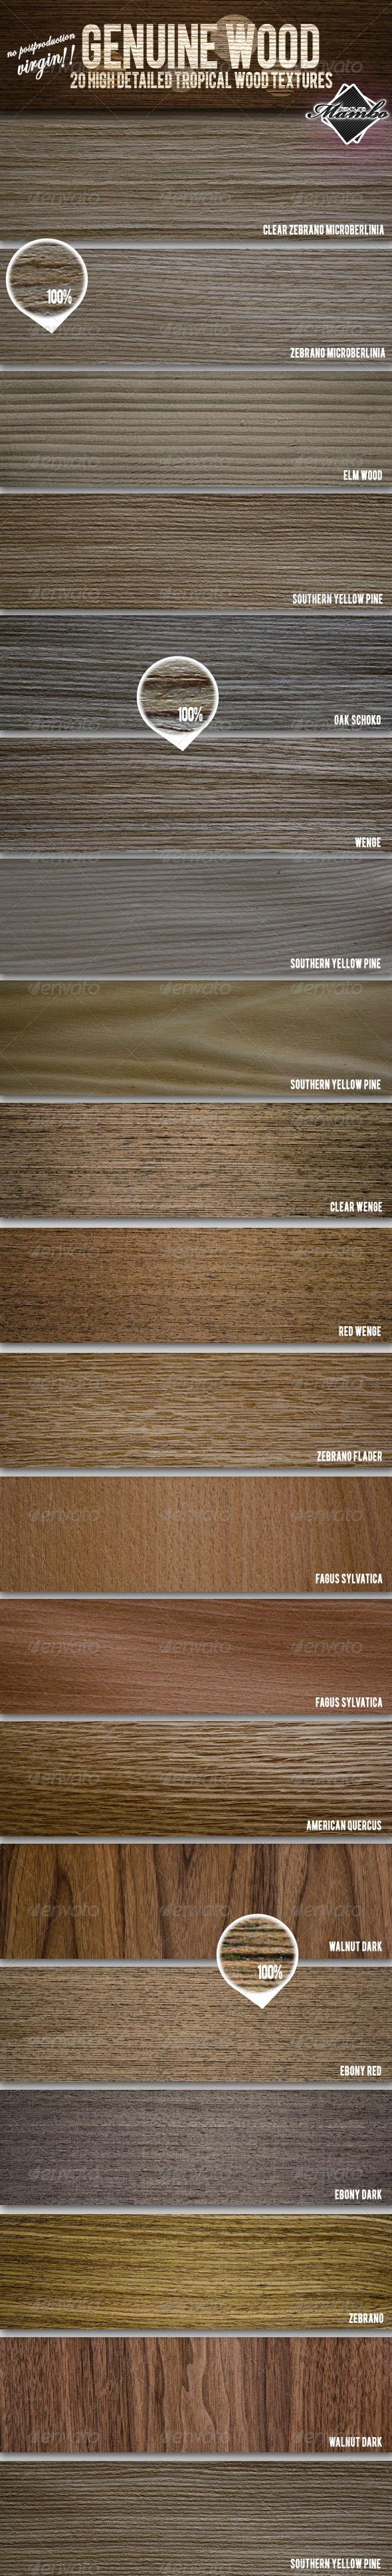 Genuine Wood - 20 Tropical Wood Textures - Wood Textures